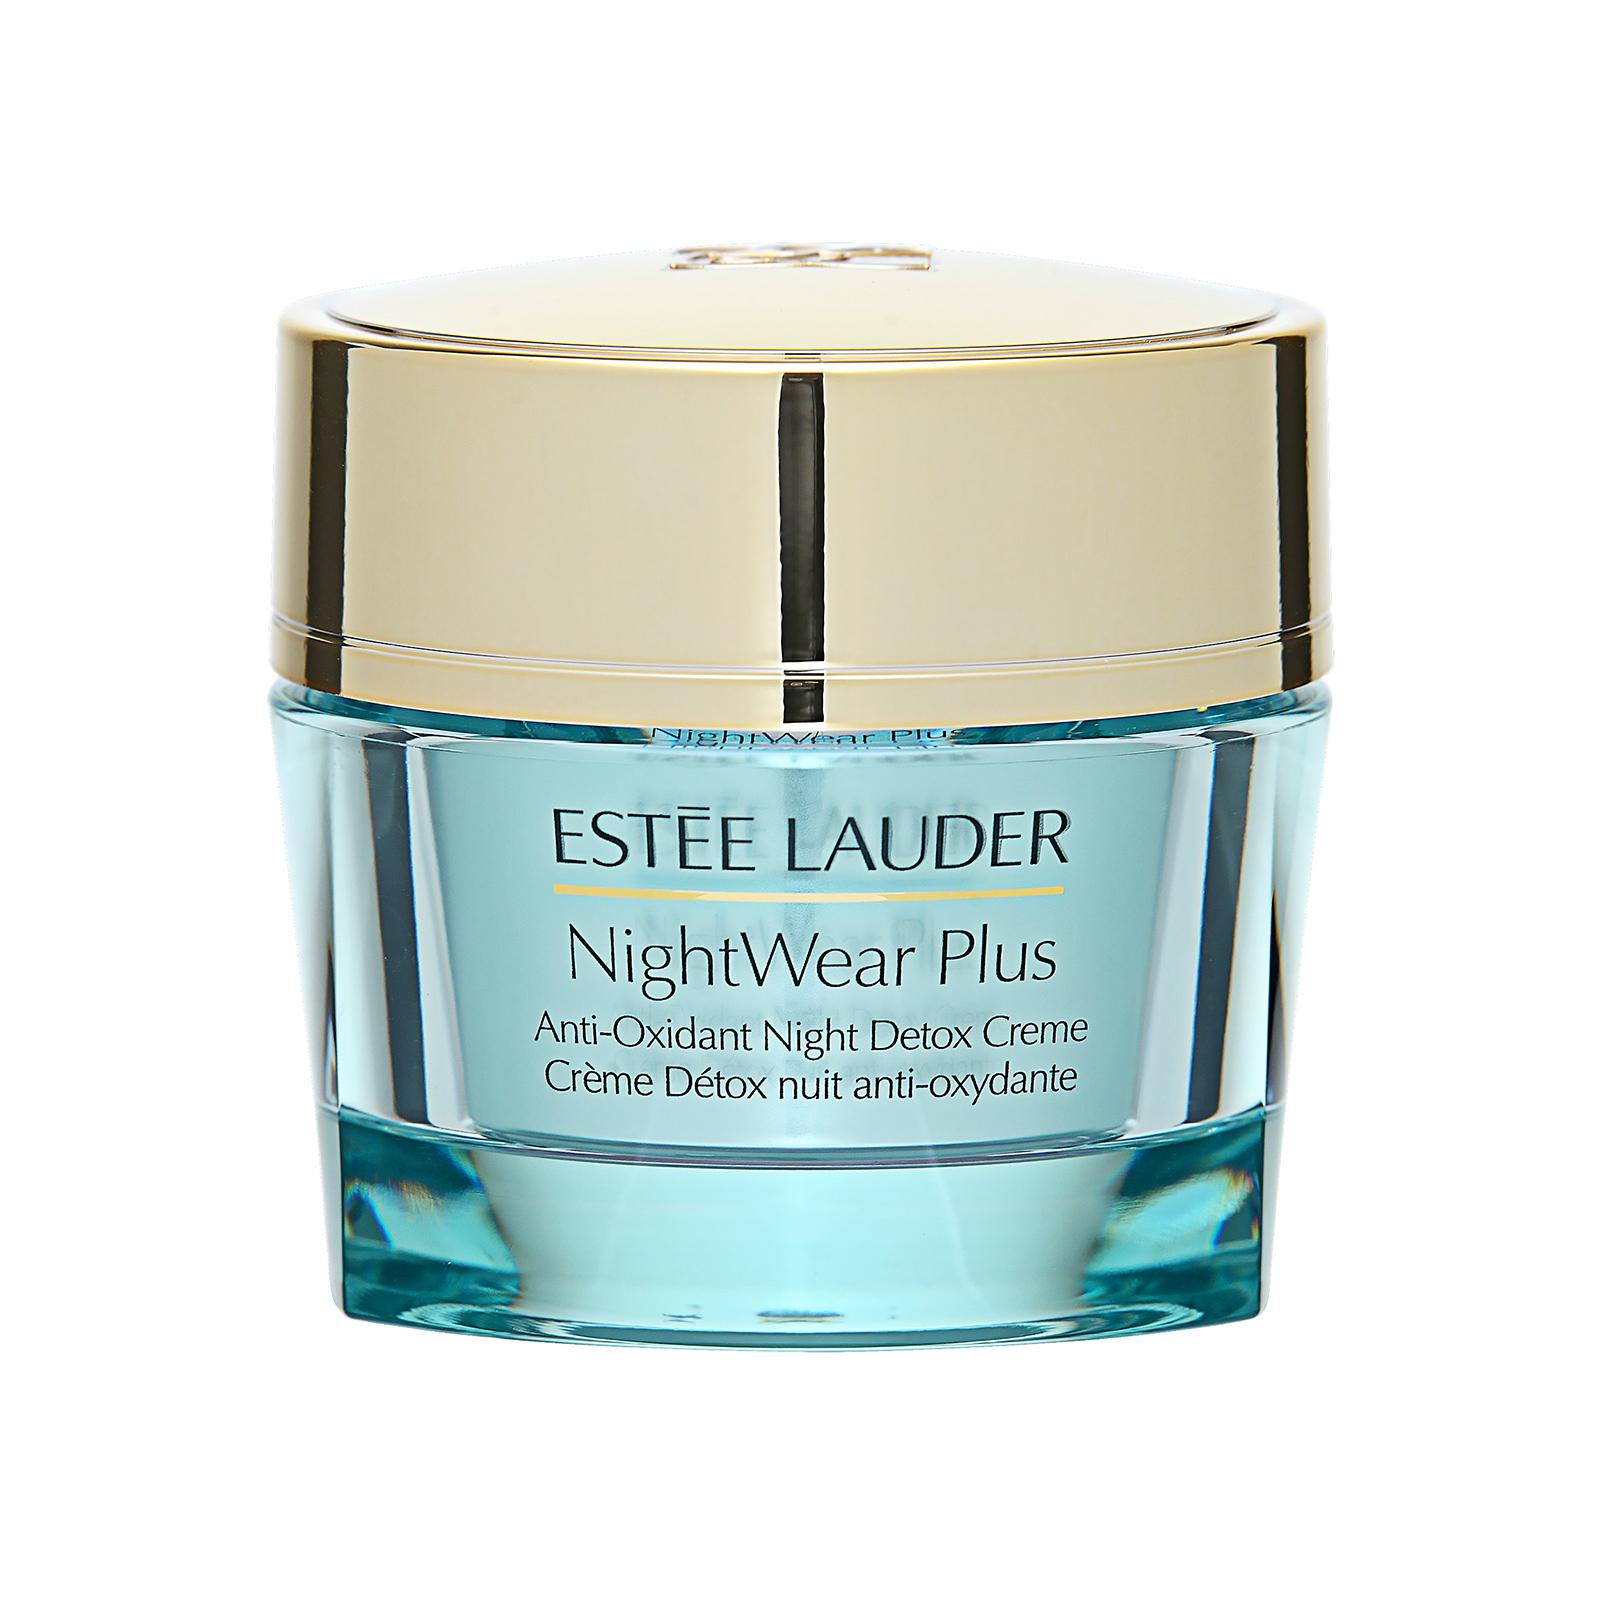 Estée Lauder NightWear Plus  Anti-Oxidant Night Detox Crème (All Skin Types)  1.7oz, 50ml from Cosme-De.com